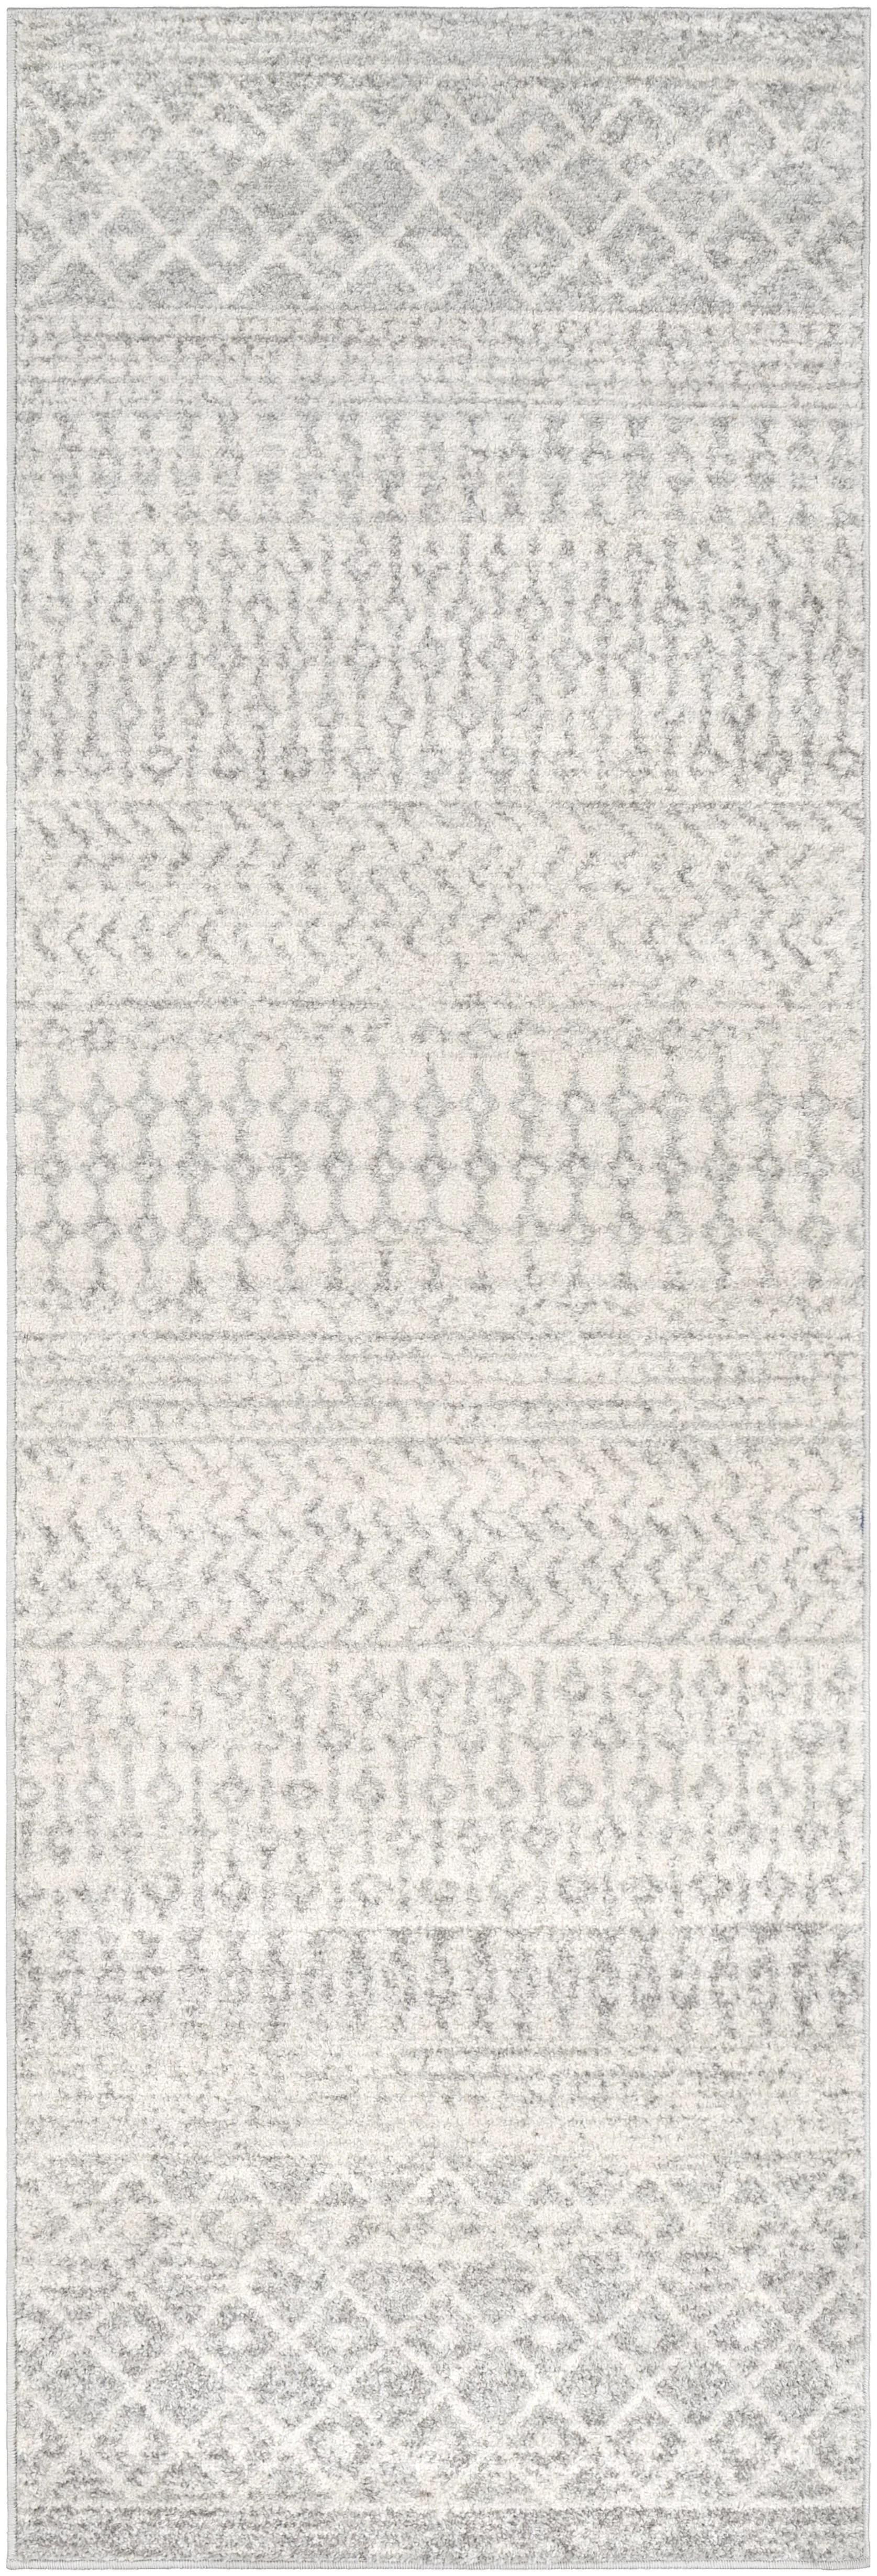 Union Rustic Kreutzer Distressed Gray Area Rug